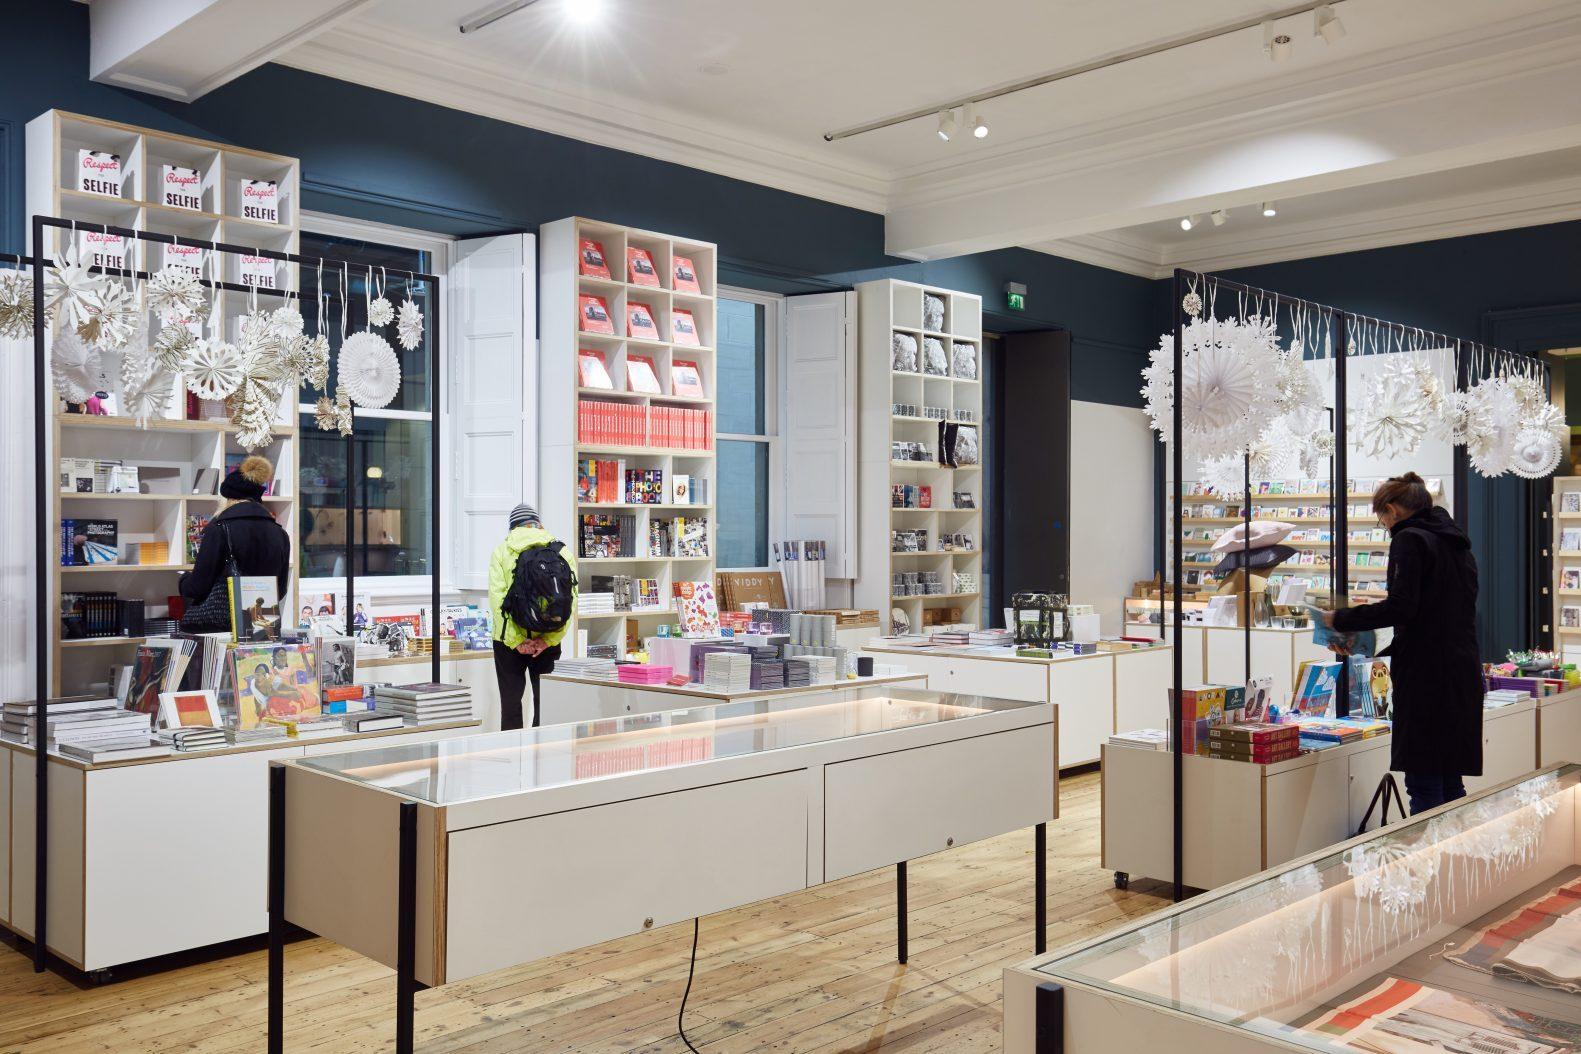 Retail Design for Manchester Art Gallery Shop